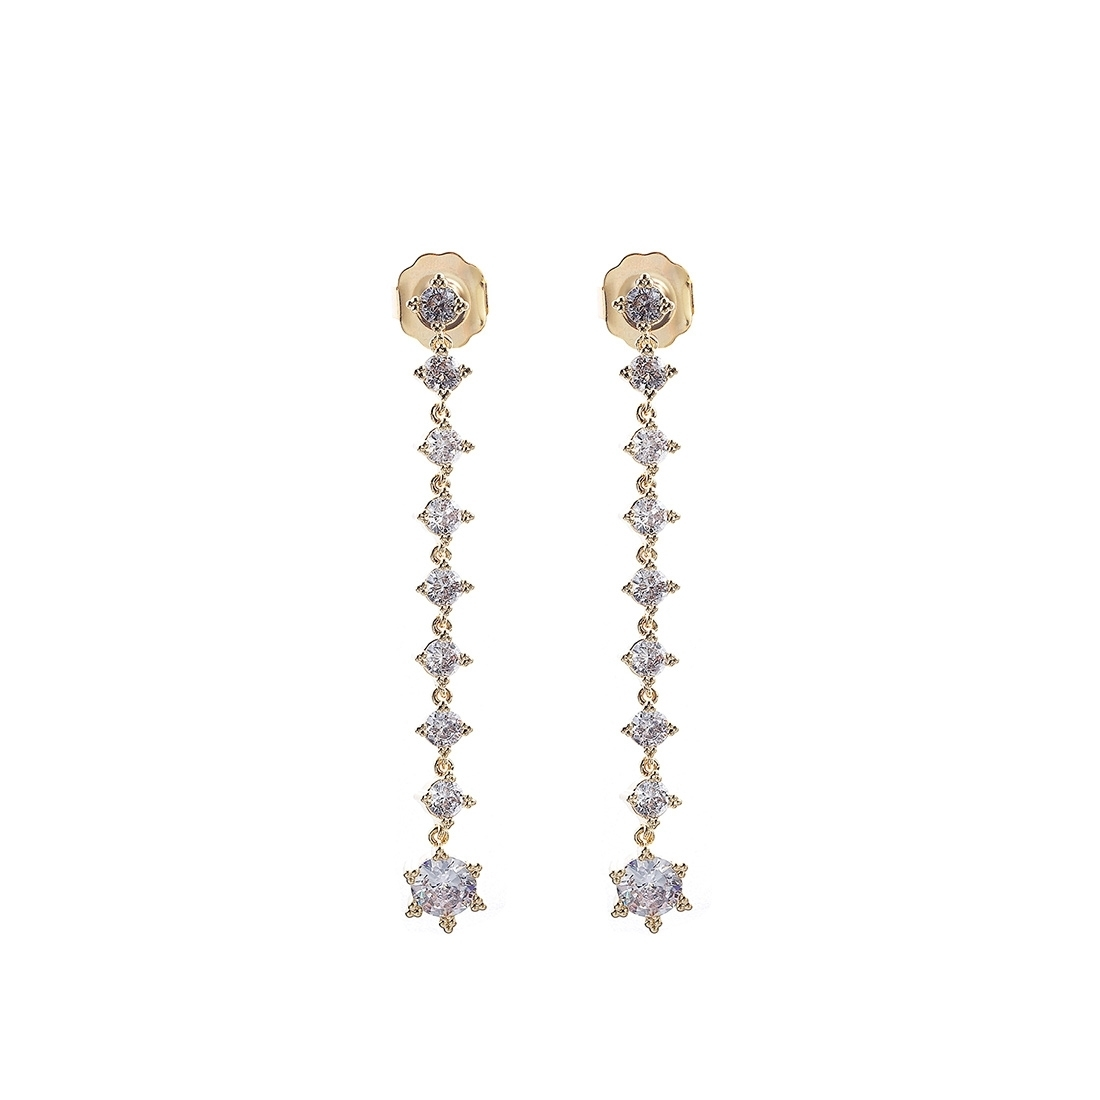 Bridal Shoes Harvey Nichols: MeMe London Josette Earrings